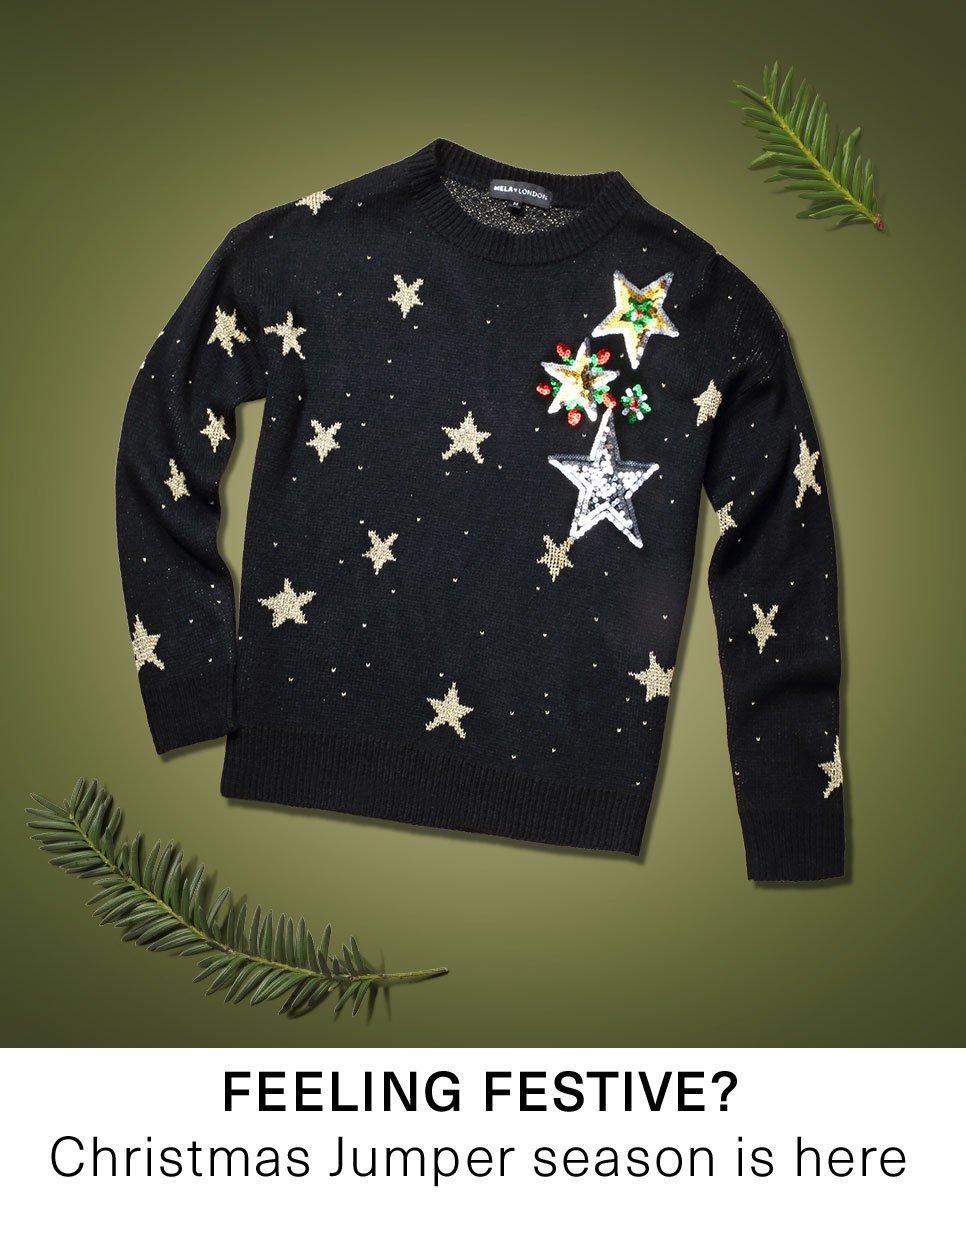 Feeling festive? Christmas jumper season is here